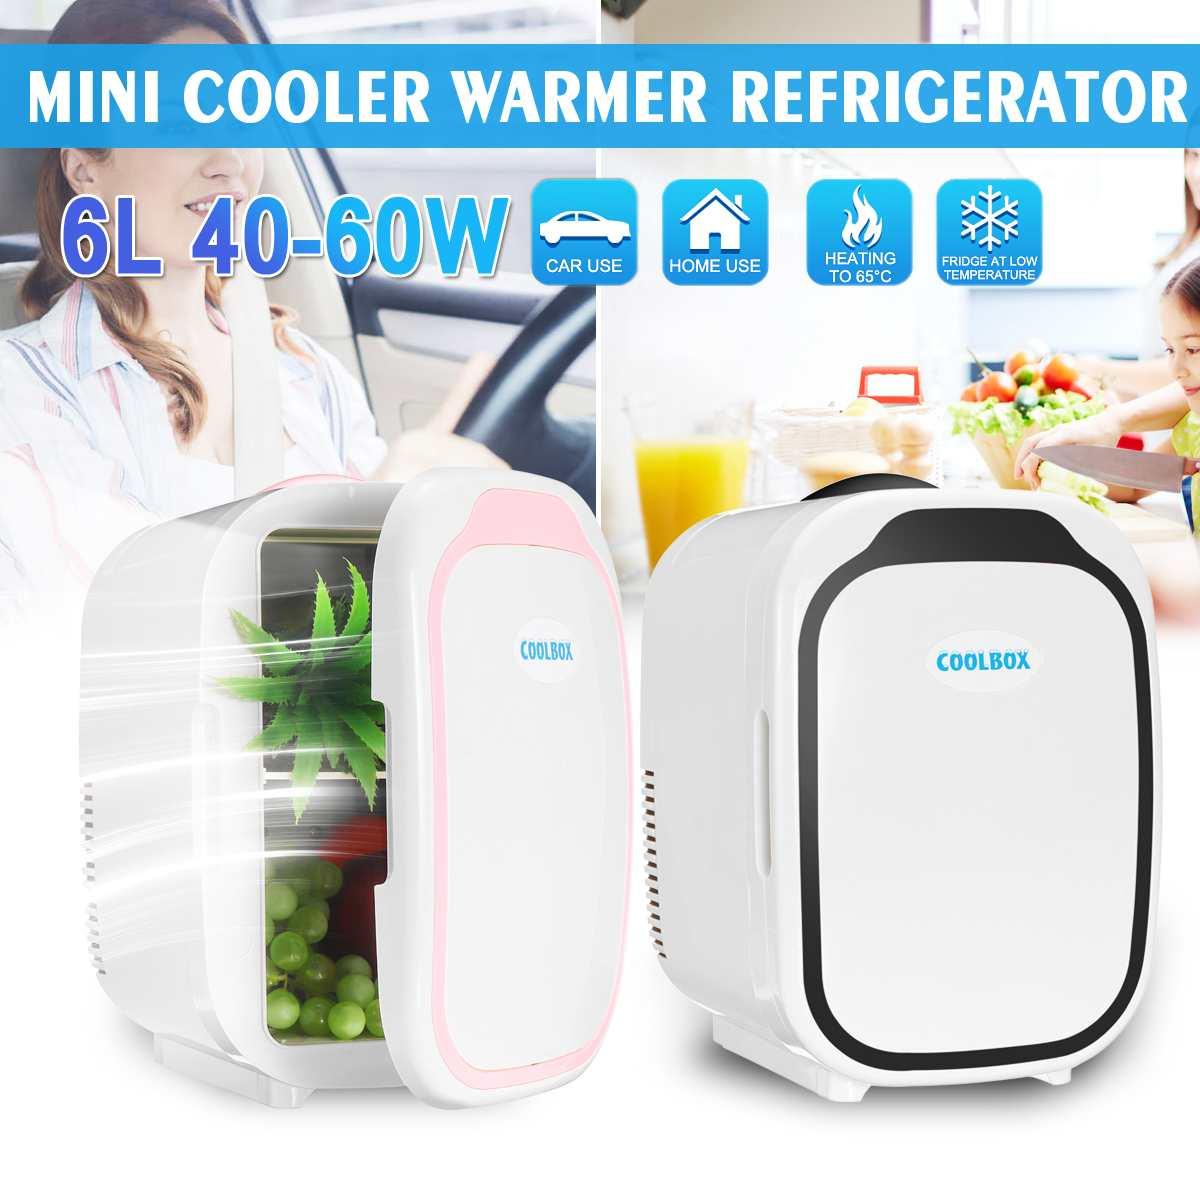 6L Fridge Quiet Refrigerators Low Noise Refrigerators Freezer Cooling Fridge